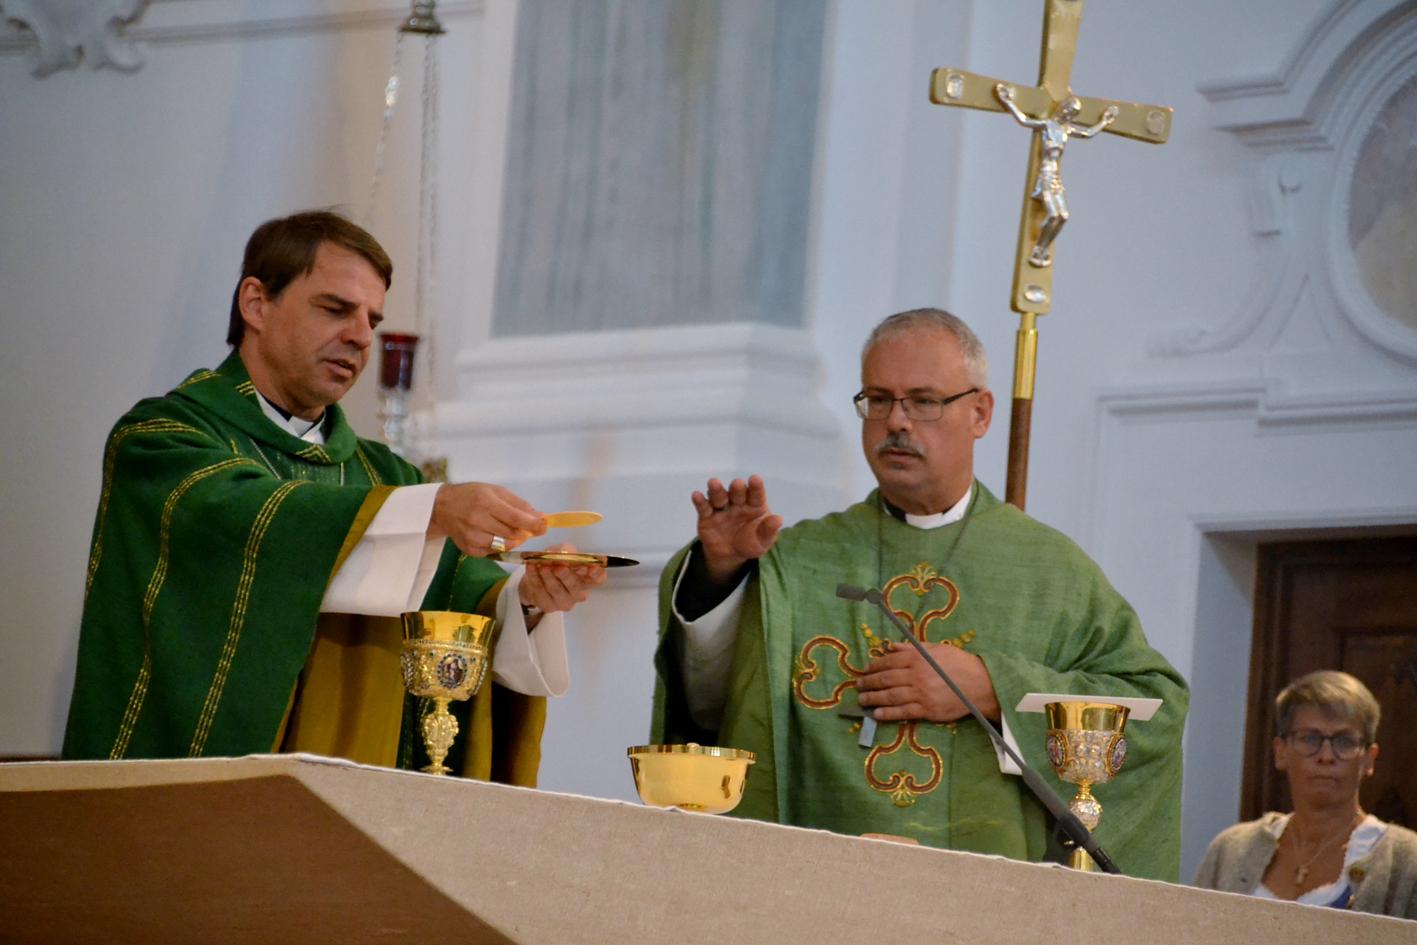 2020 09 21 aoelfb installation praelat klaus metzl5 eucharistie